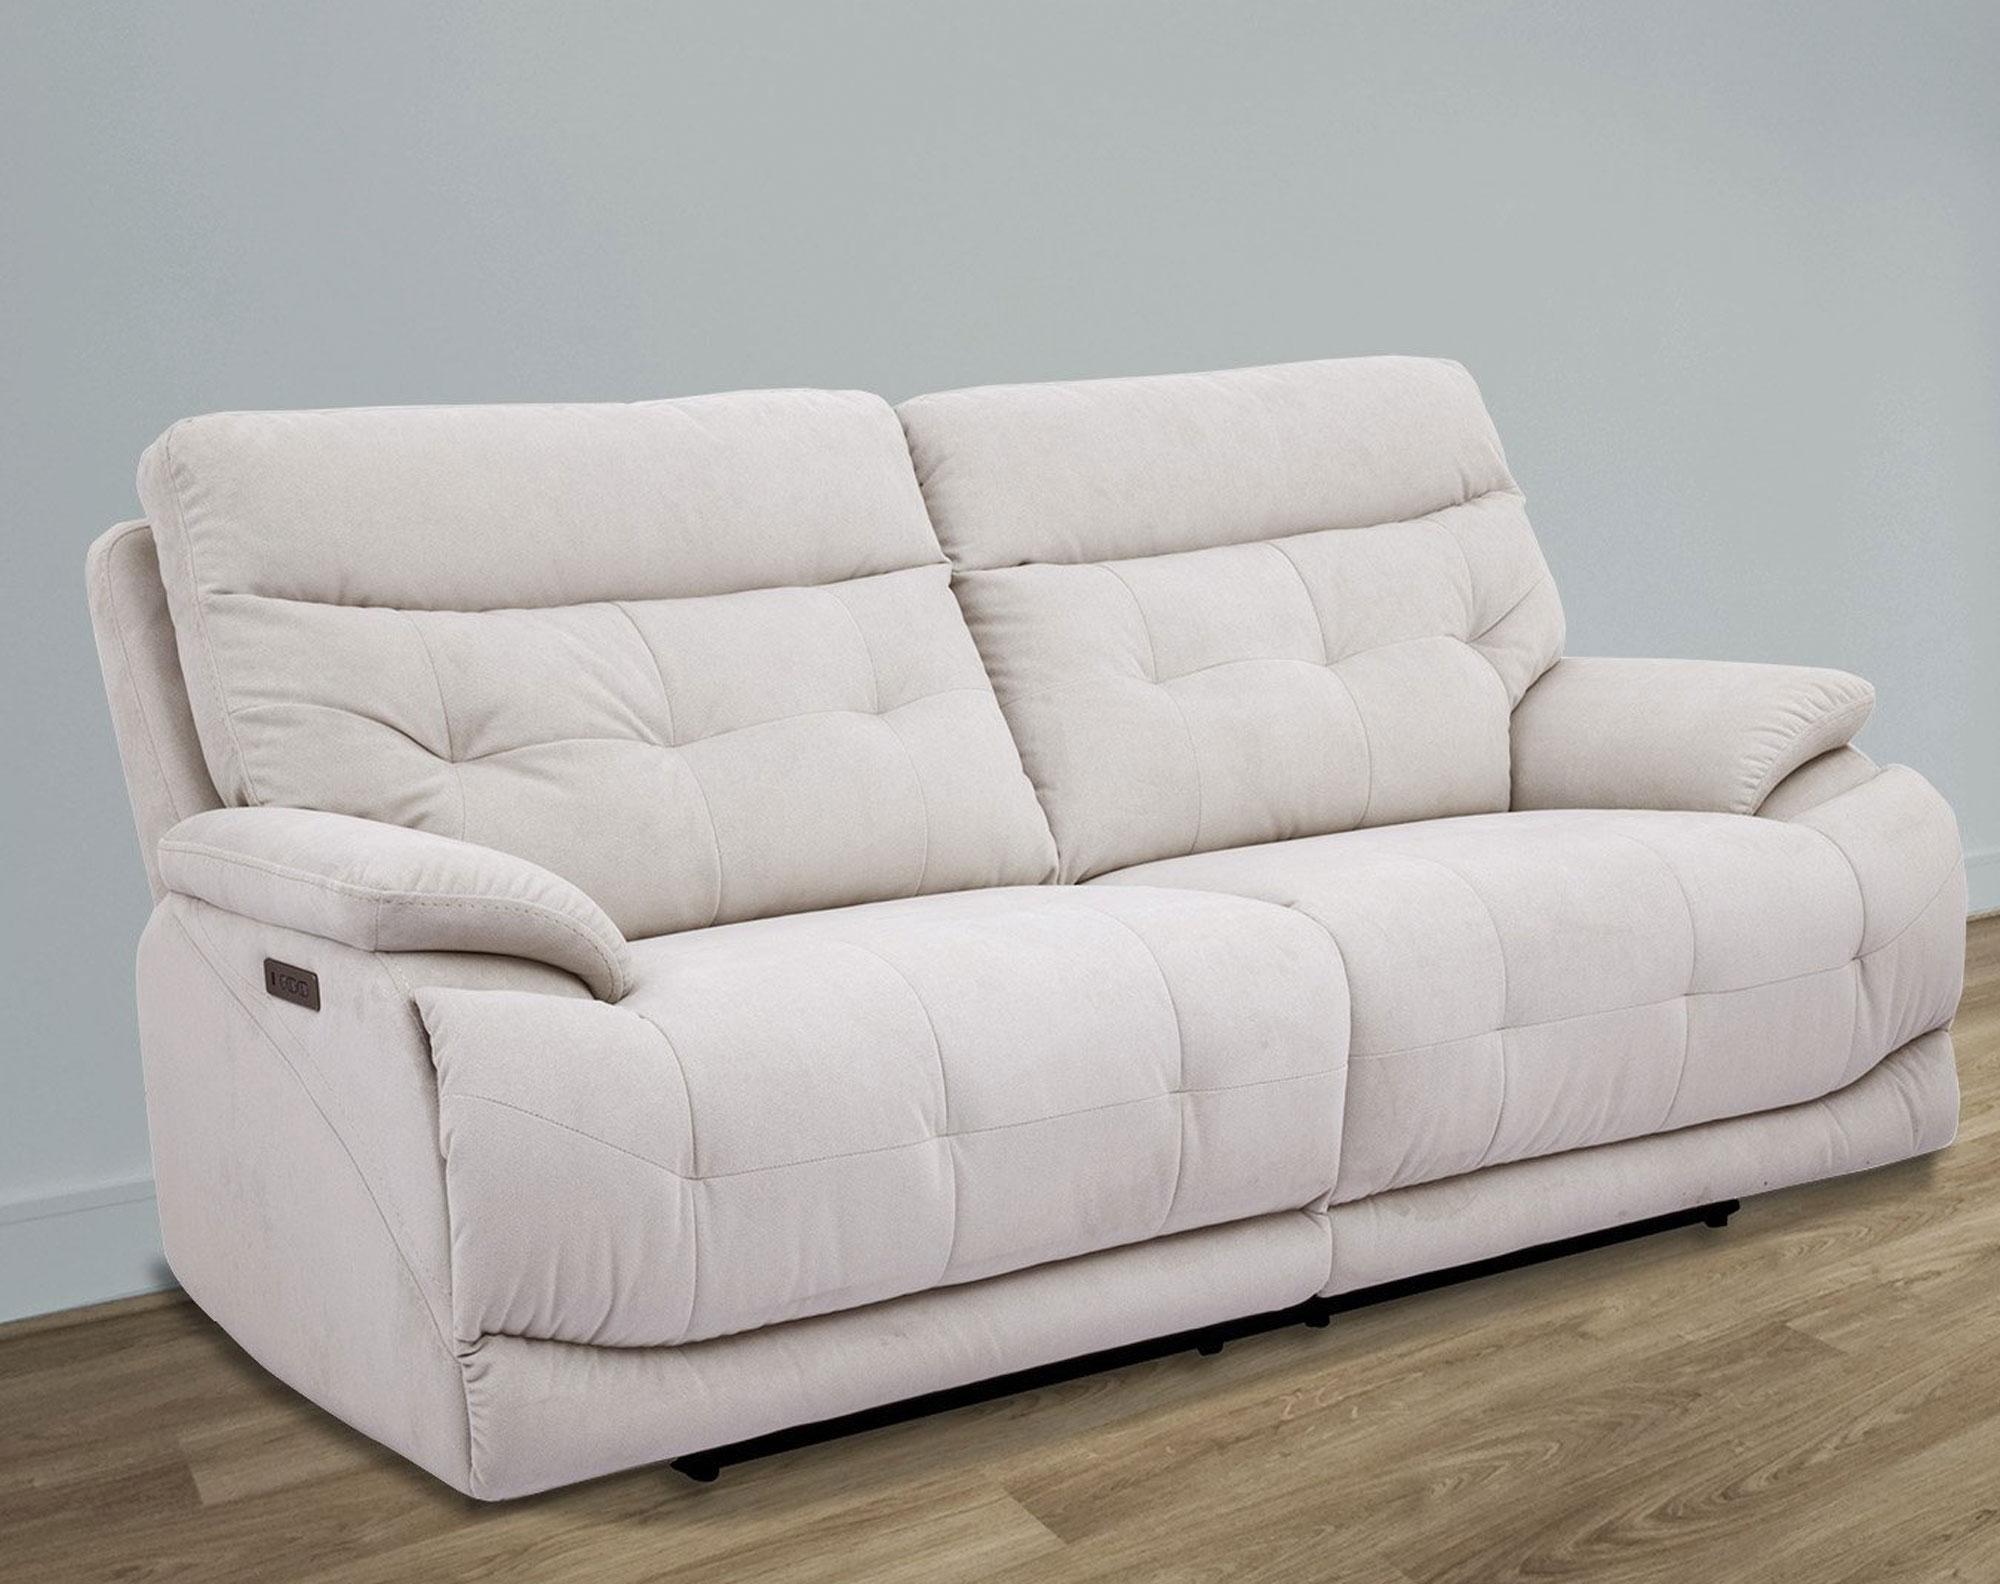 Astonishing Stratus Cozy Power Sofa With Power Headrest Sofas And Ibusinesslaw Wood Chair Design Ideas Ibusinesslaworg